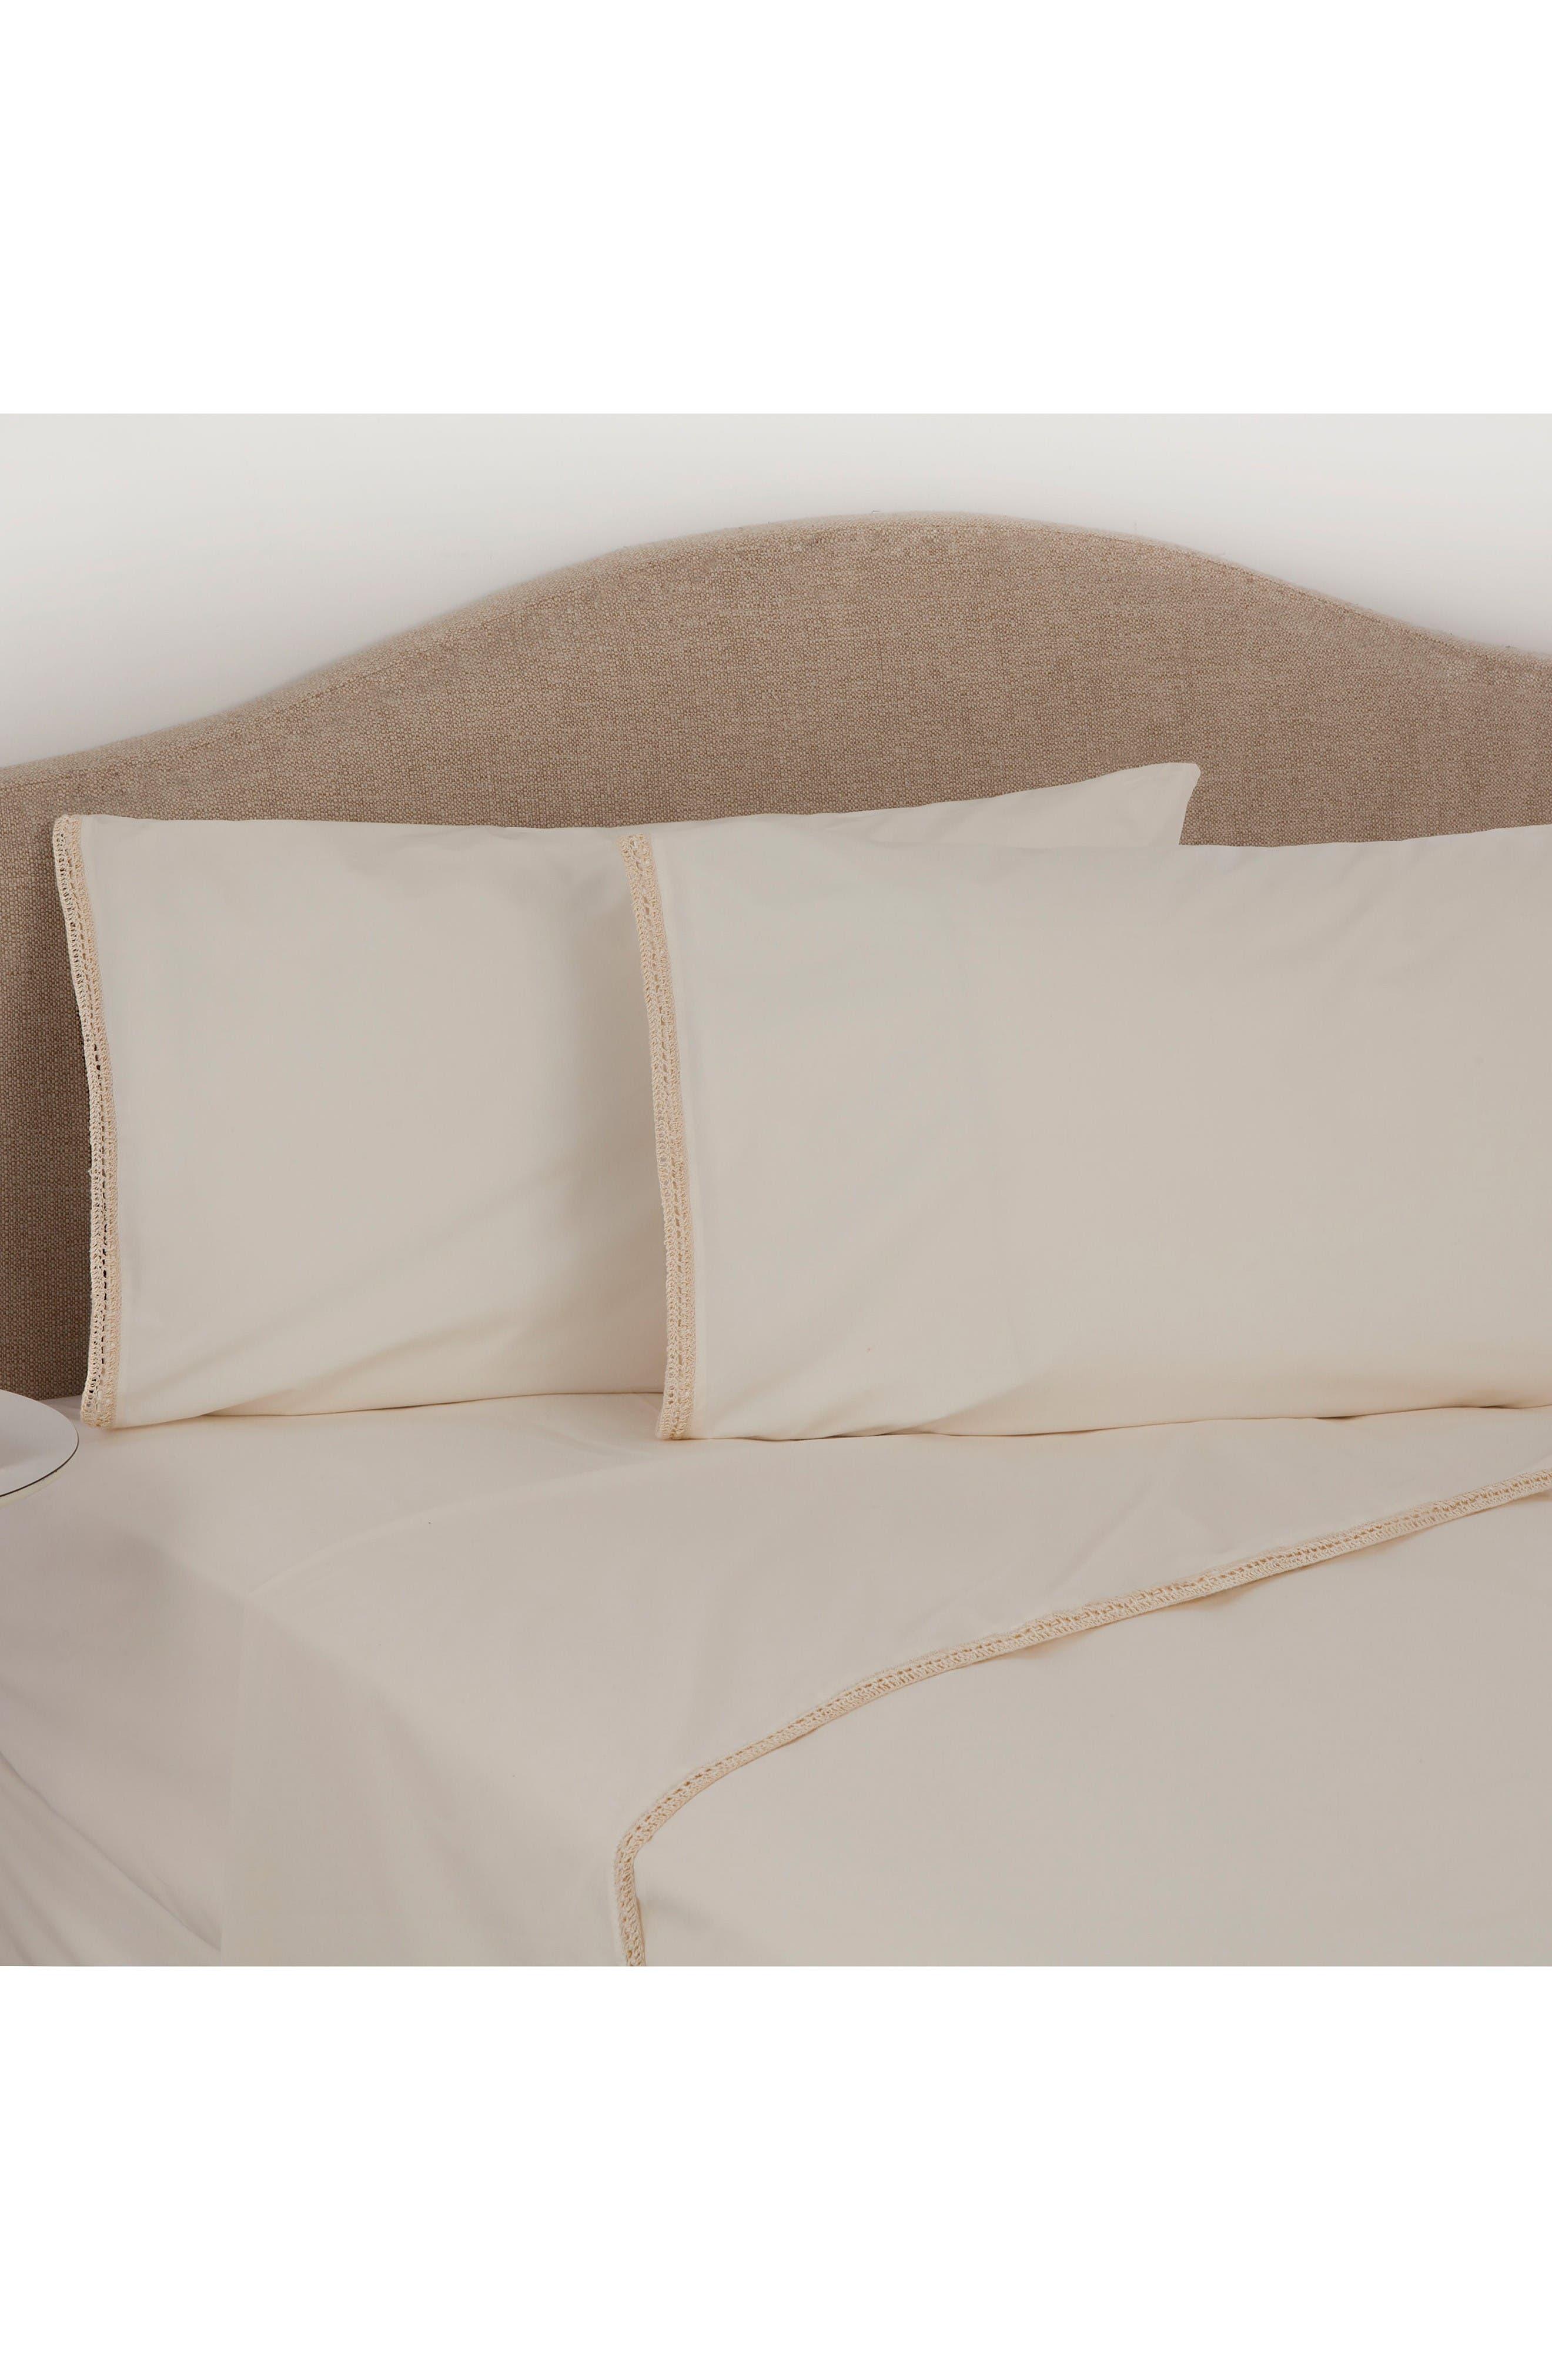 Main Image - Portico Crochet Trim Pillowcases